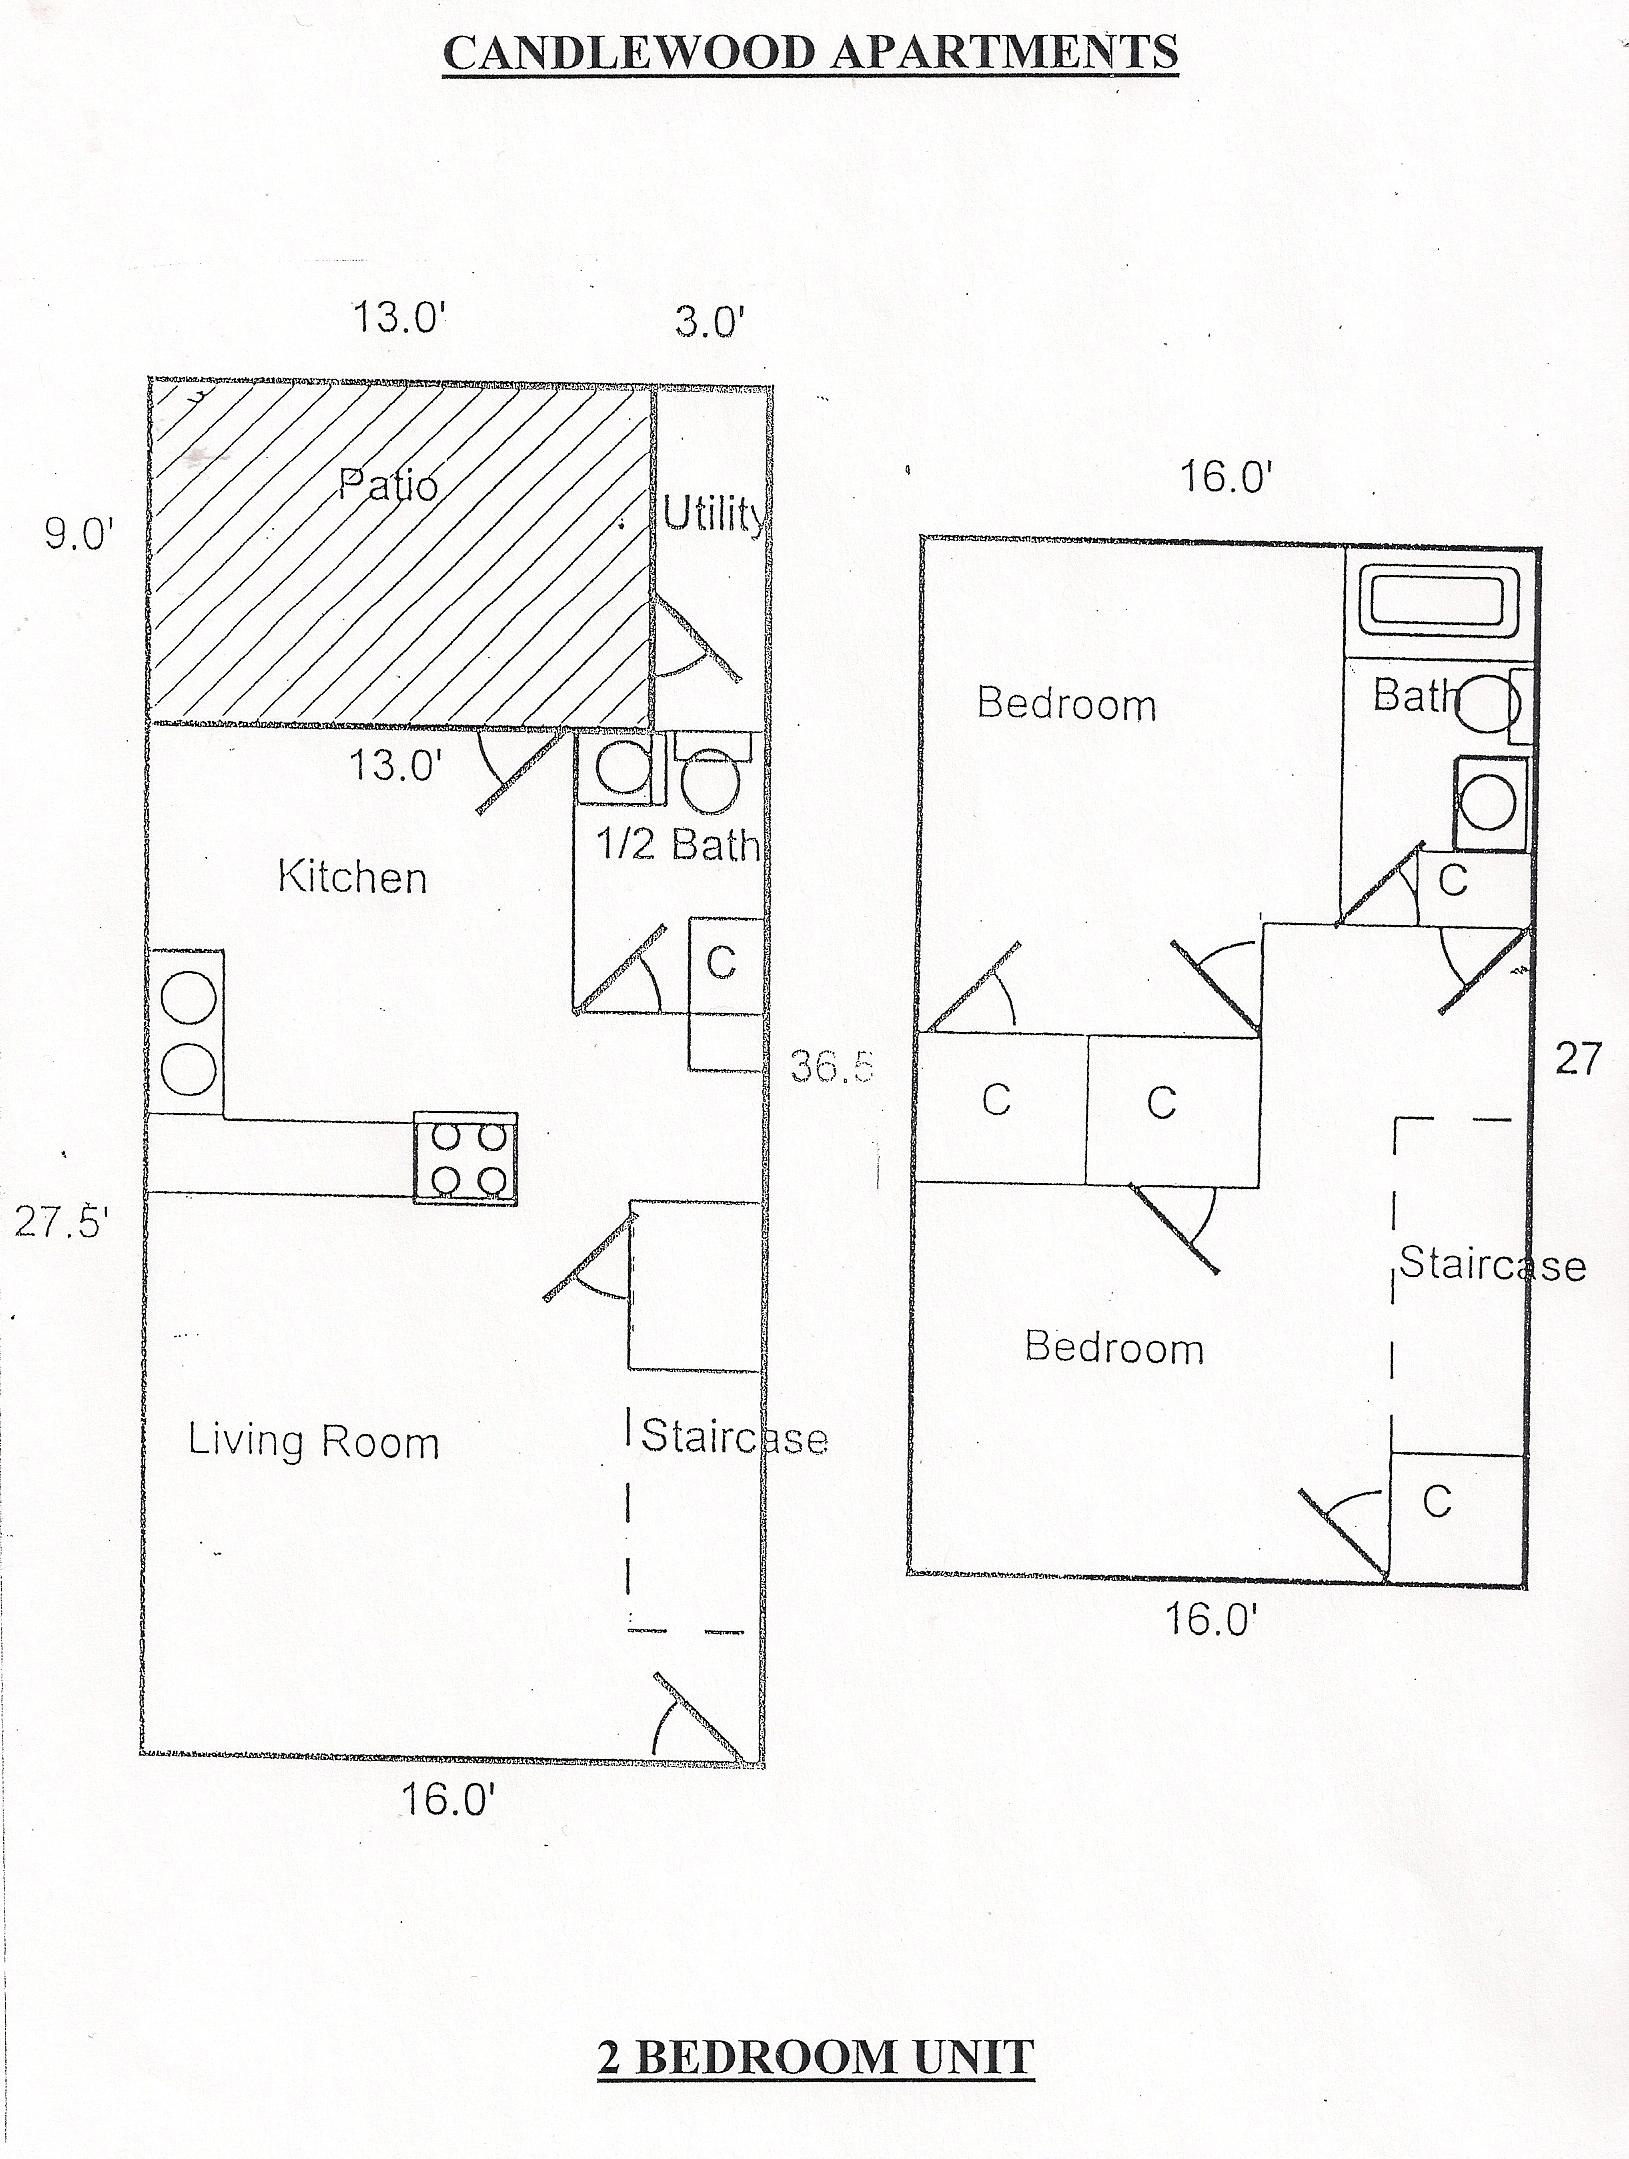 CW 2 BD floor plan